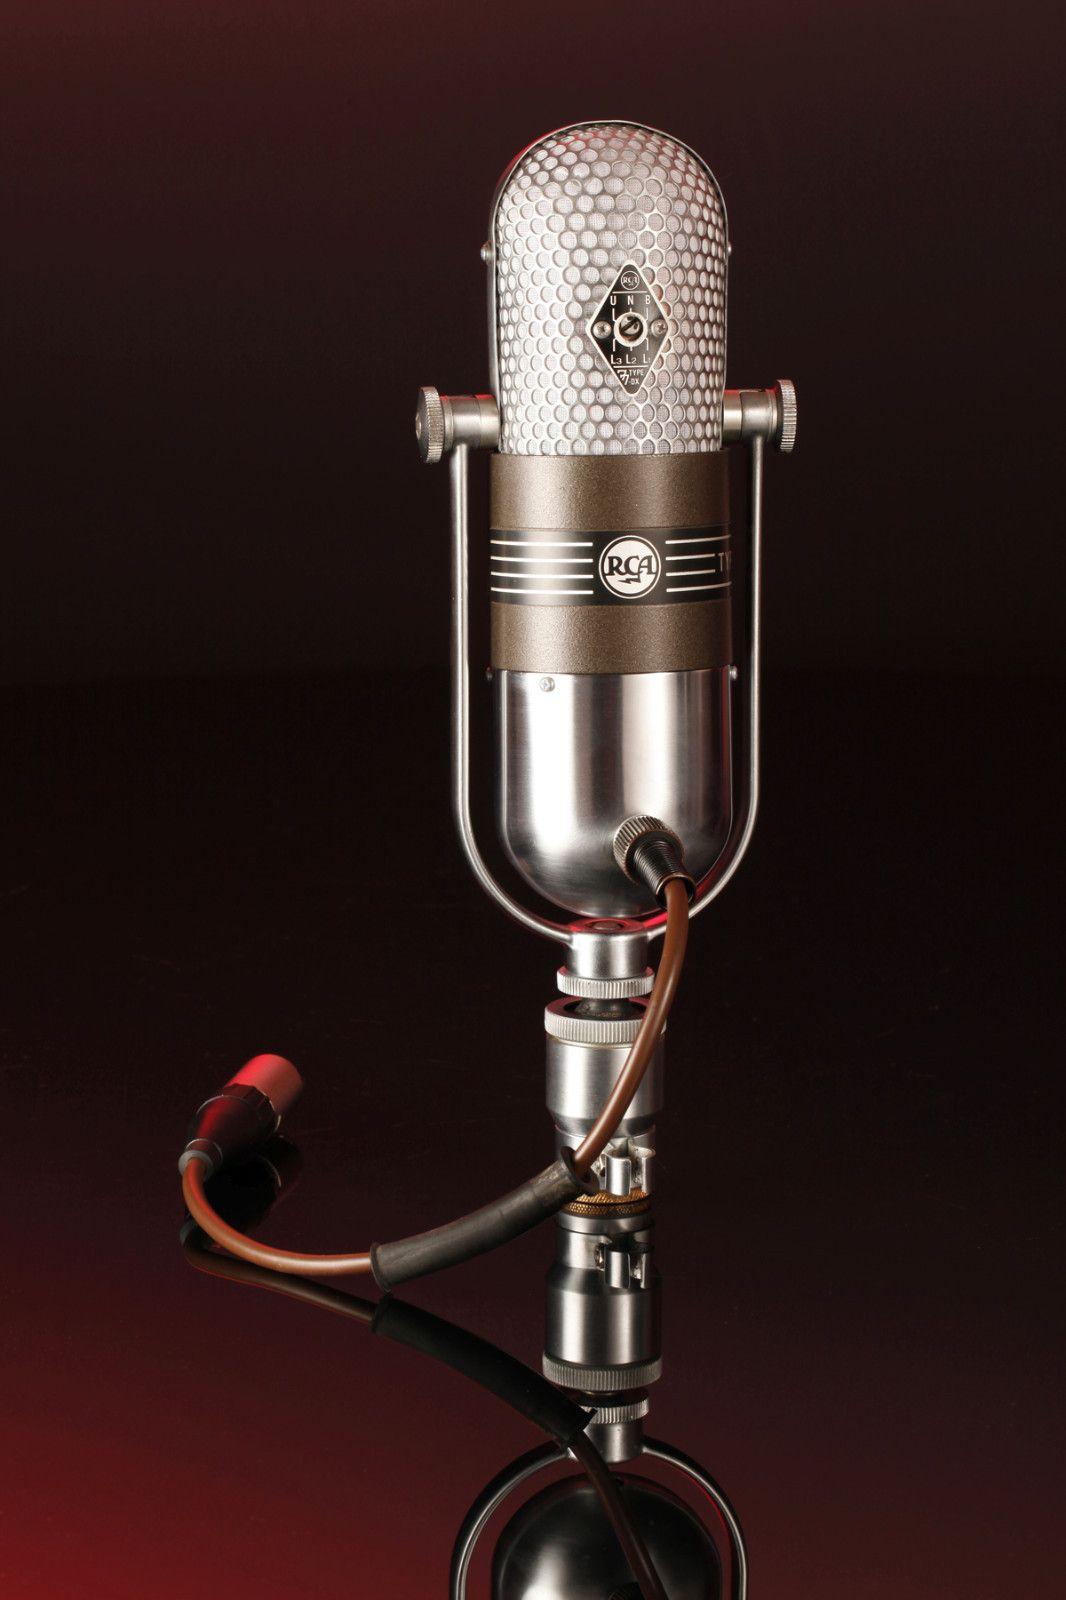 Rca 77 Dx Microphone 1954 Microphone Microphones Retro Radios